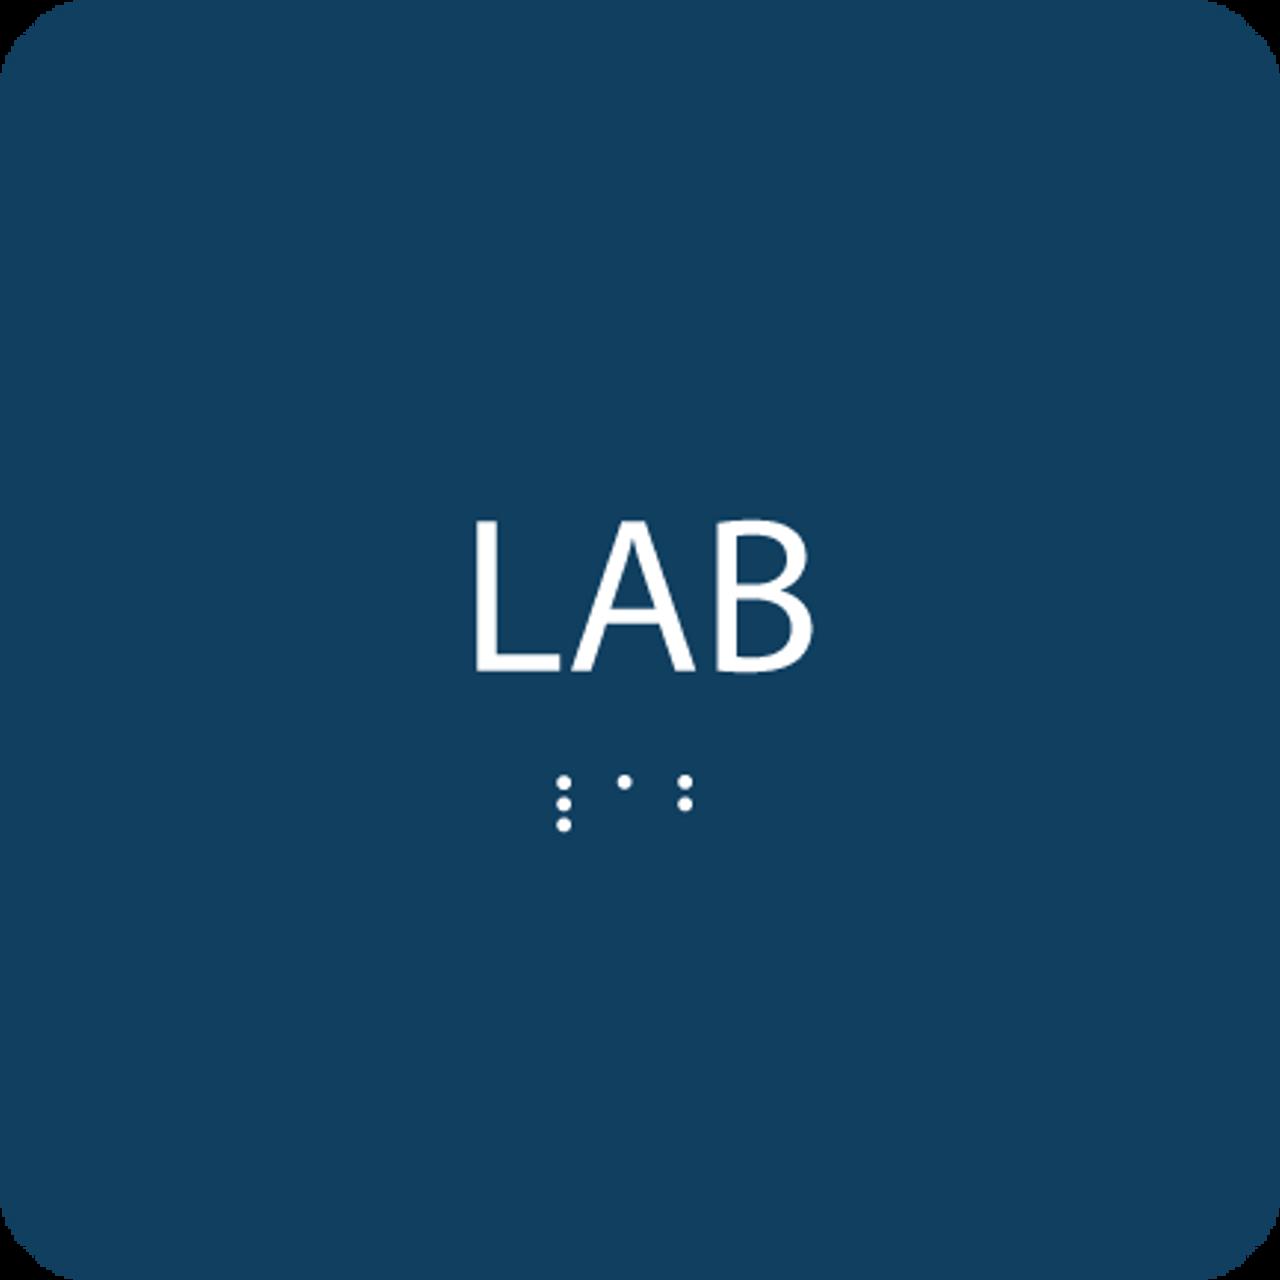 Blue Lab Tactile Sign